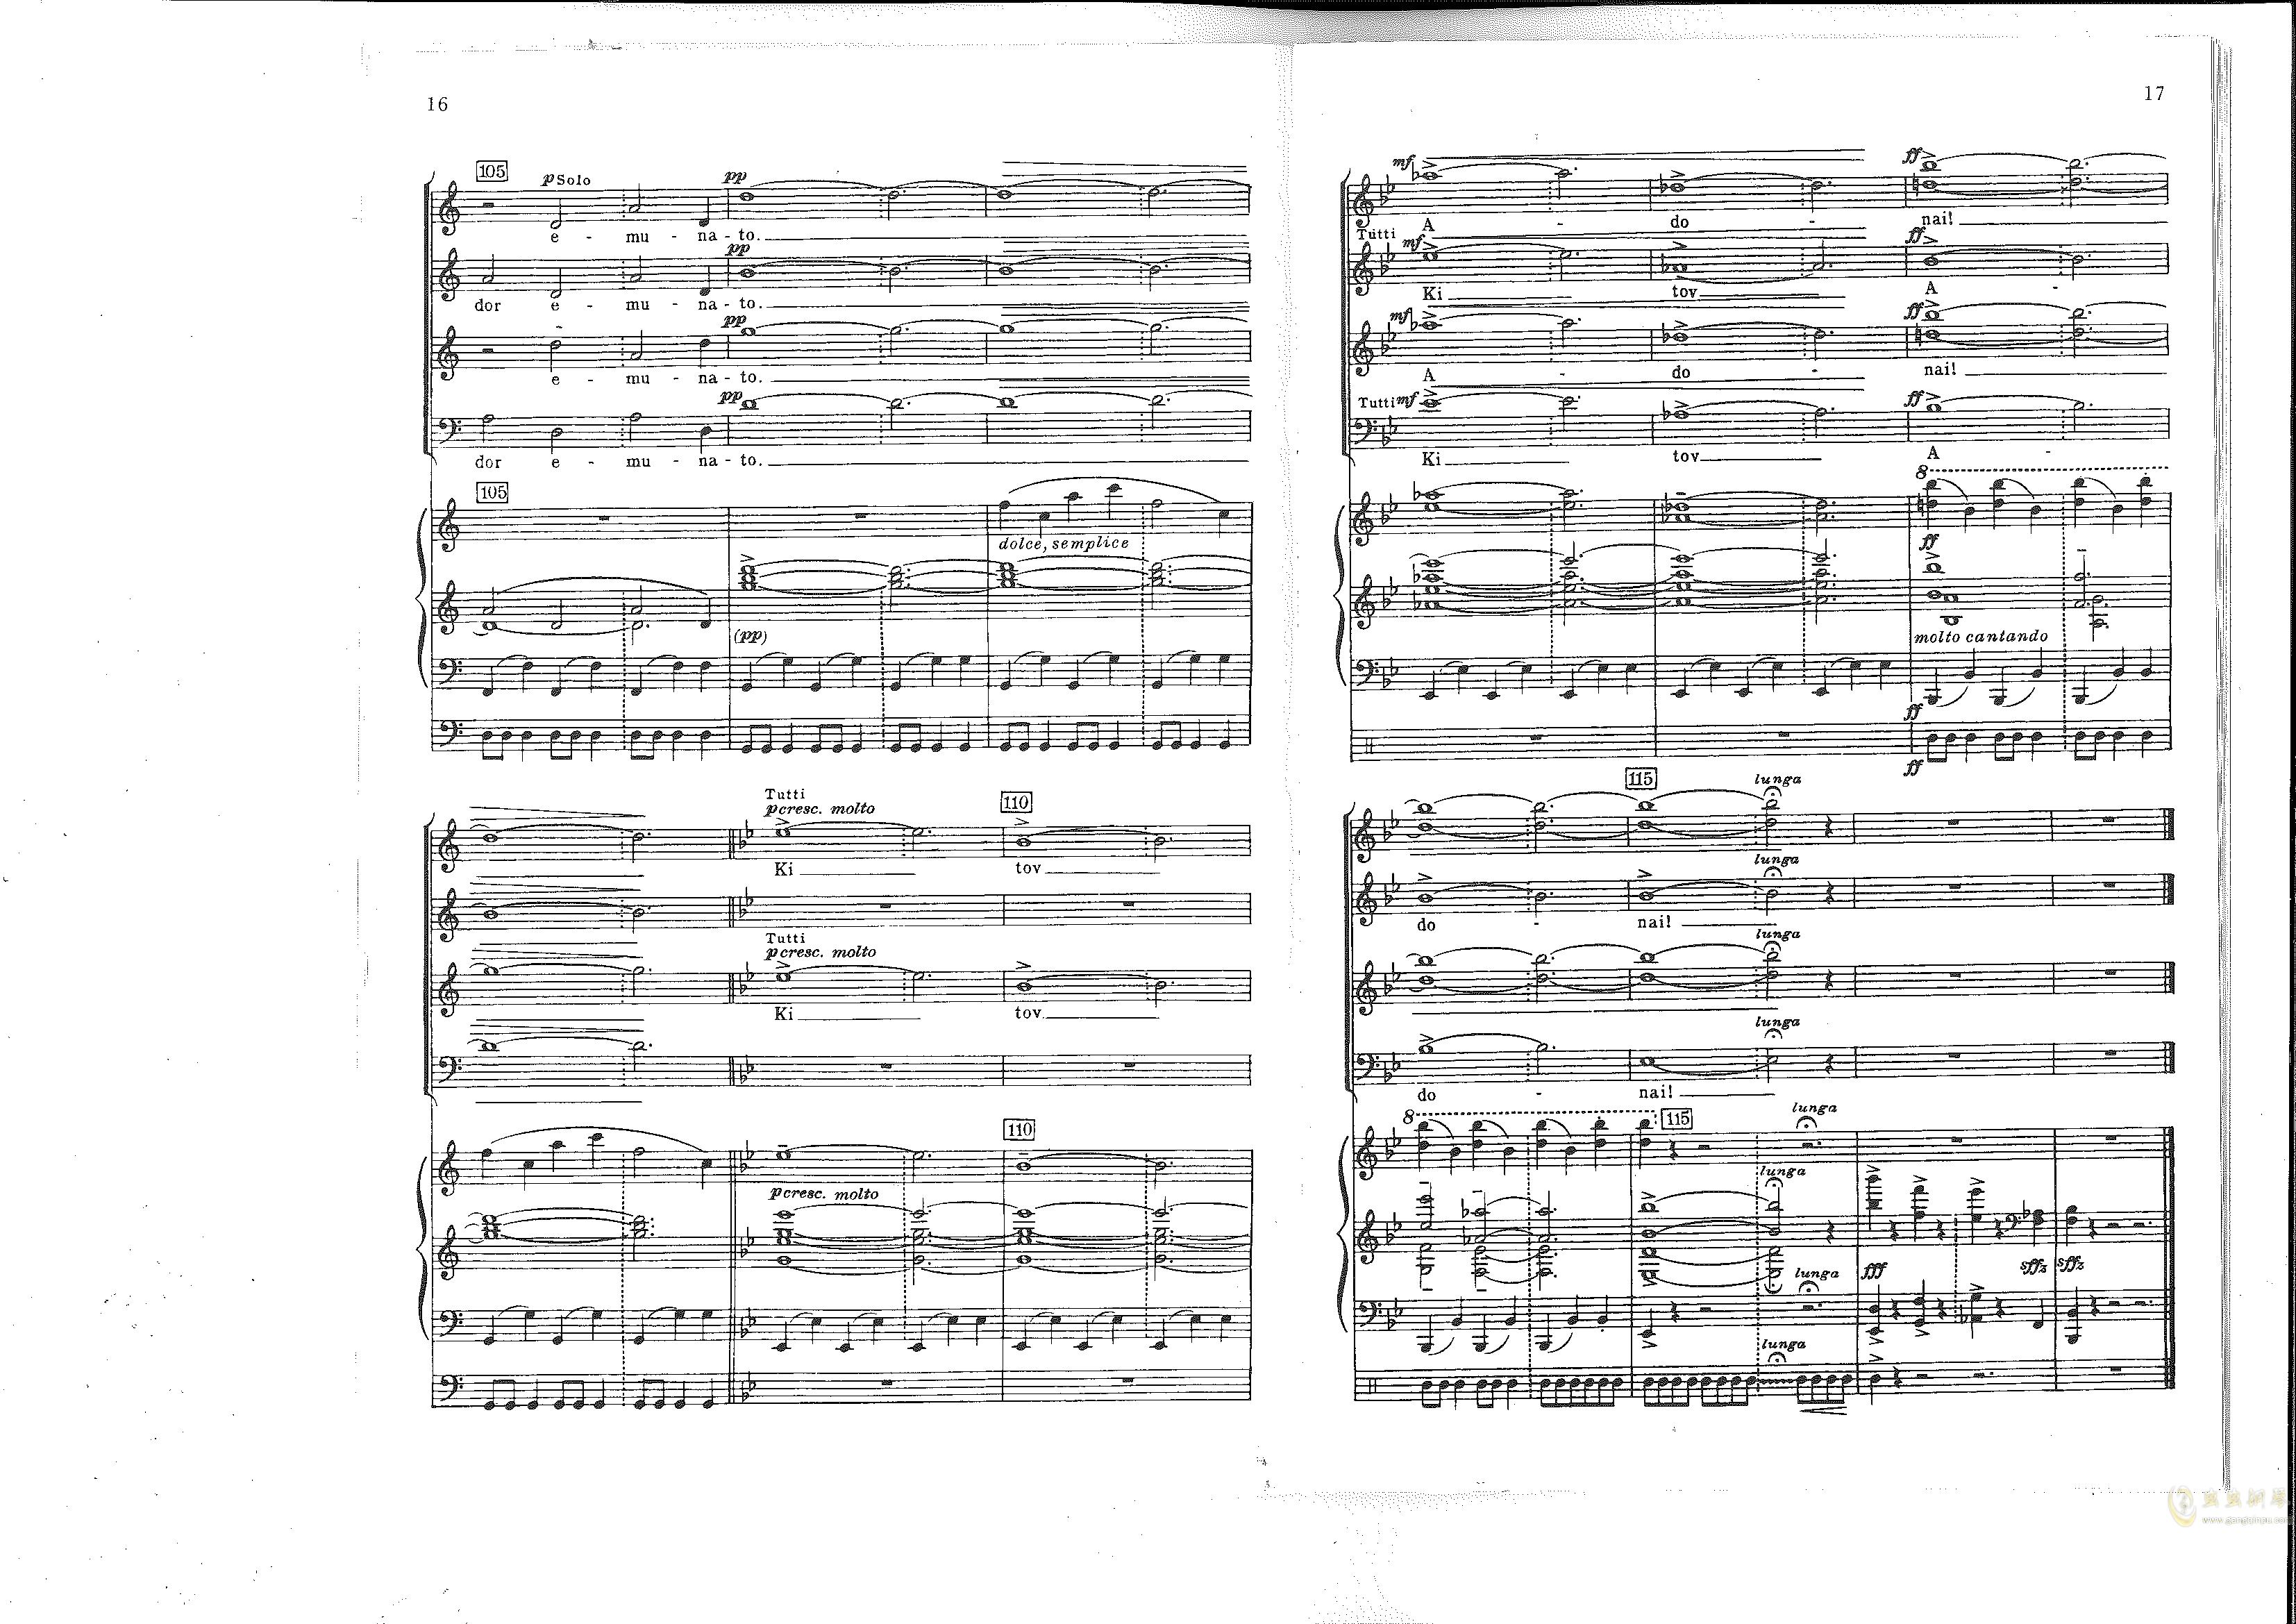 Chichester Psalms澳门星际官网 第12页